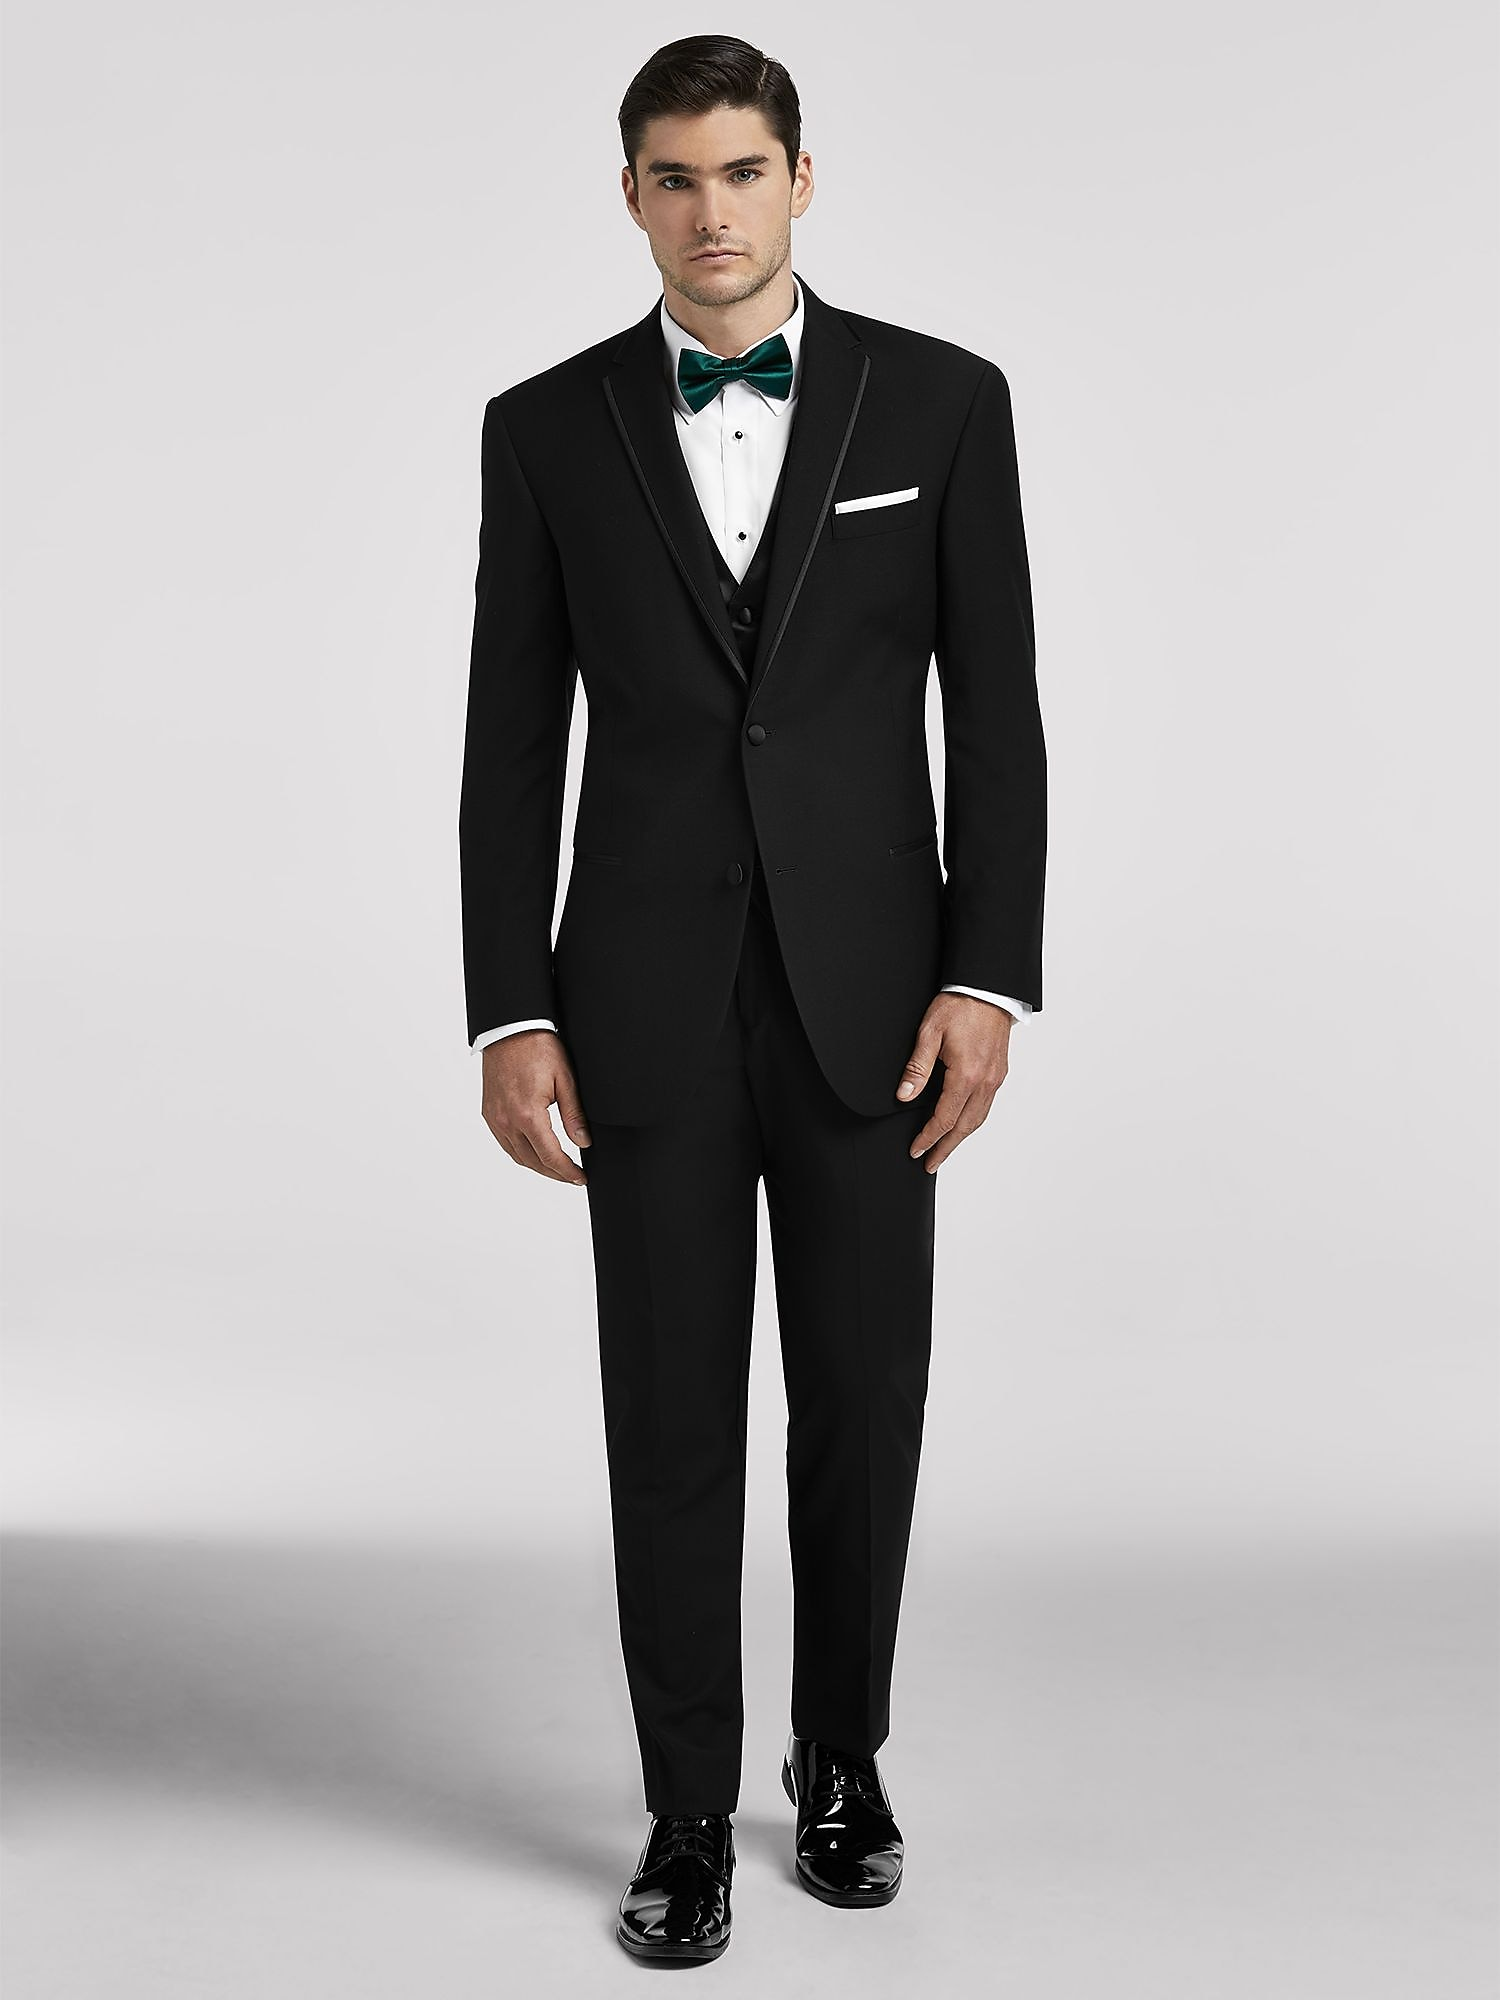 Broadway Tuxmakers Mens 2 Pc 38L Black Notch Collar Tuxedo Suit